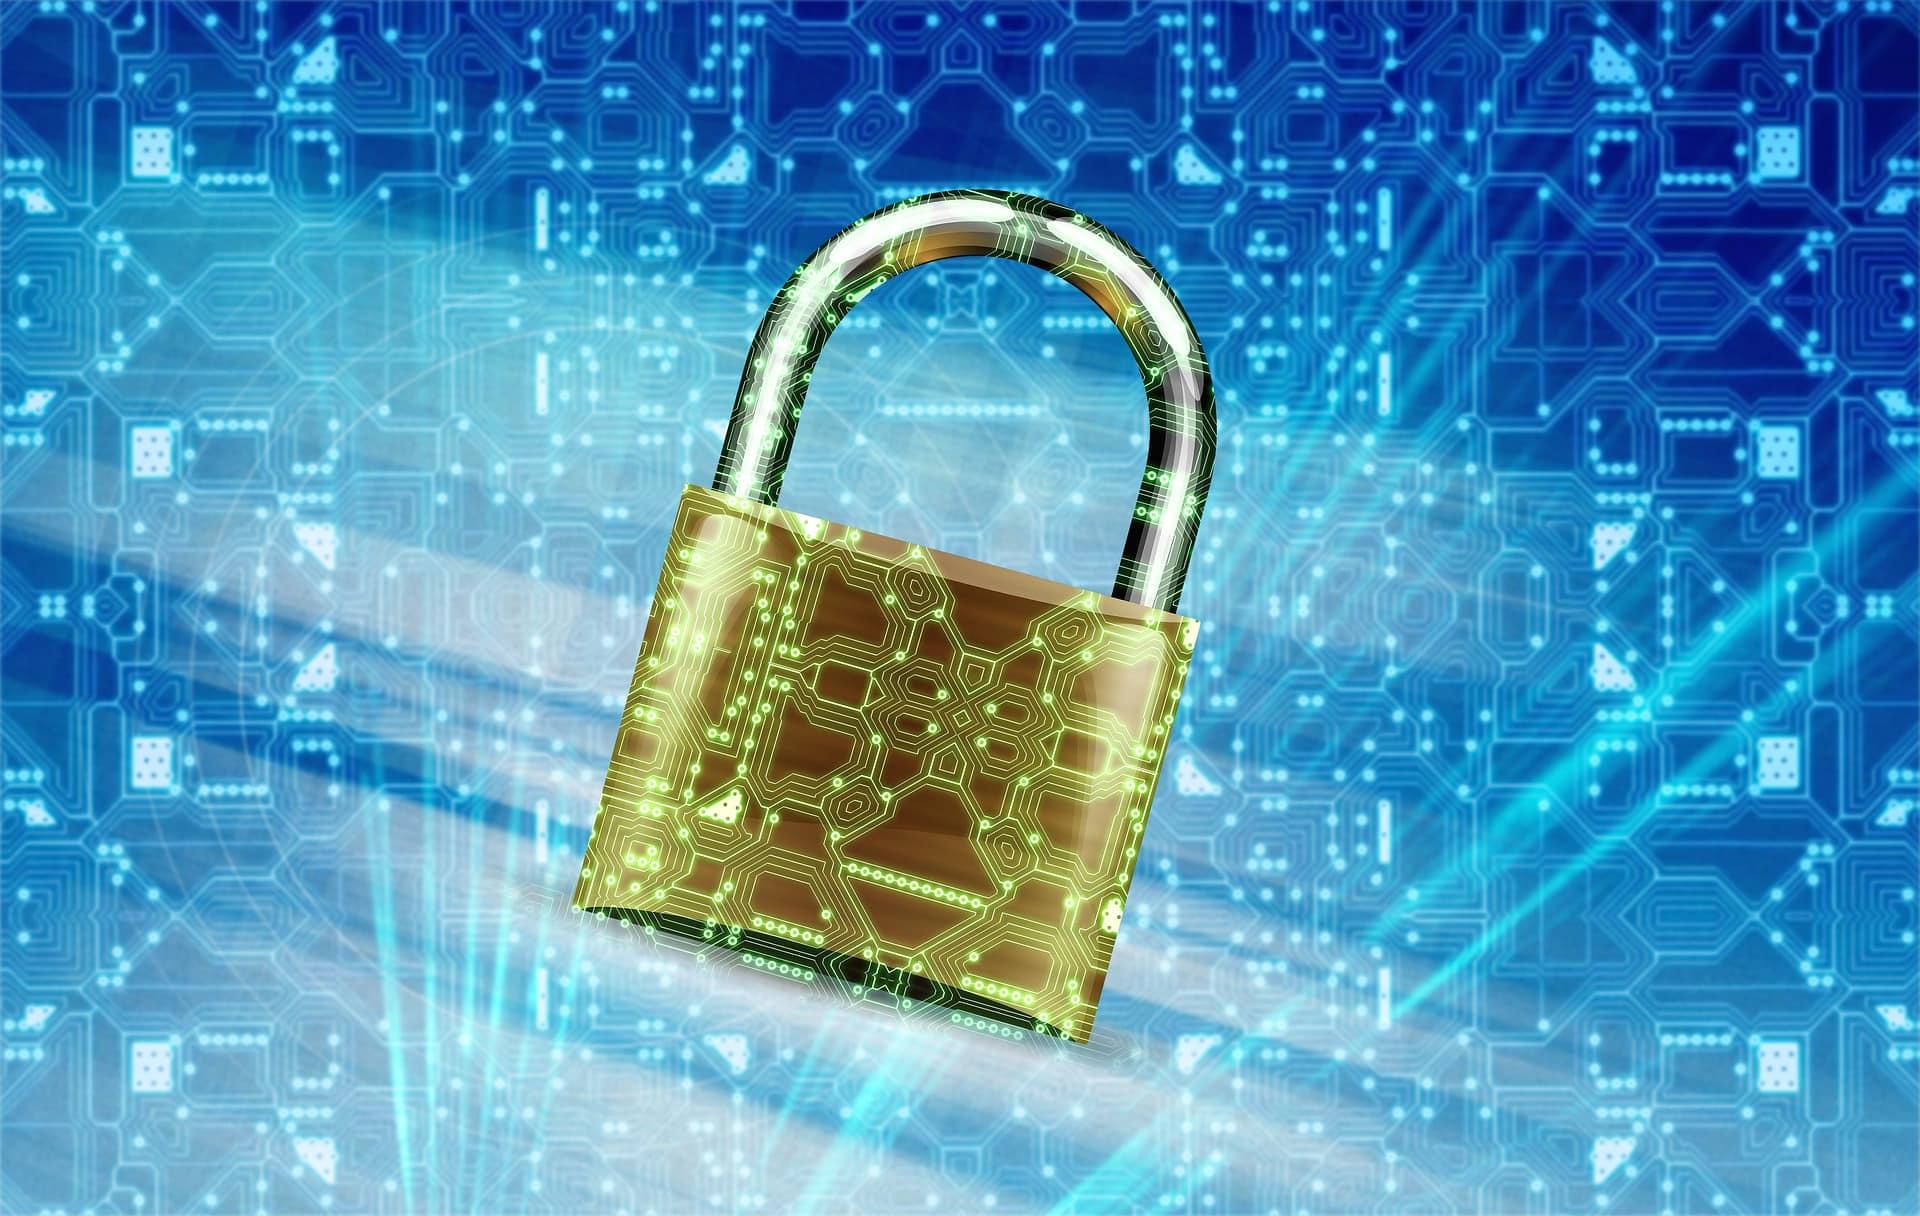 security 2168233 1920